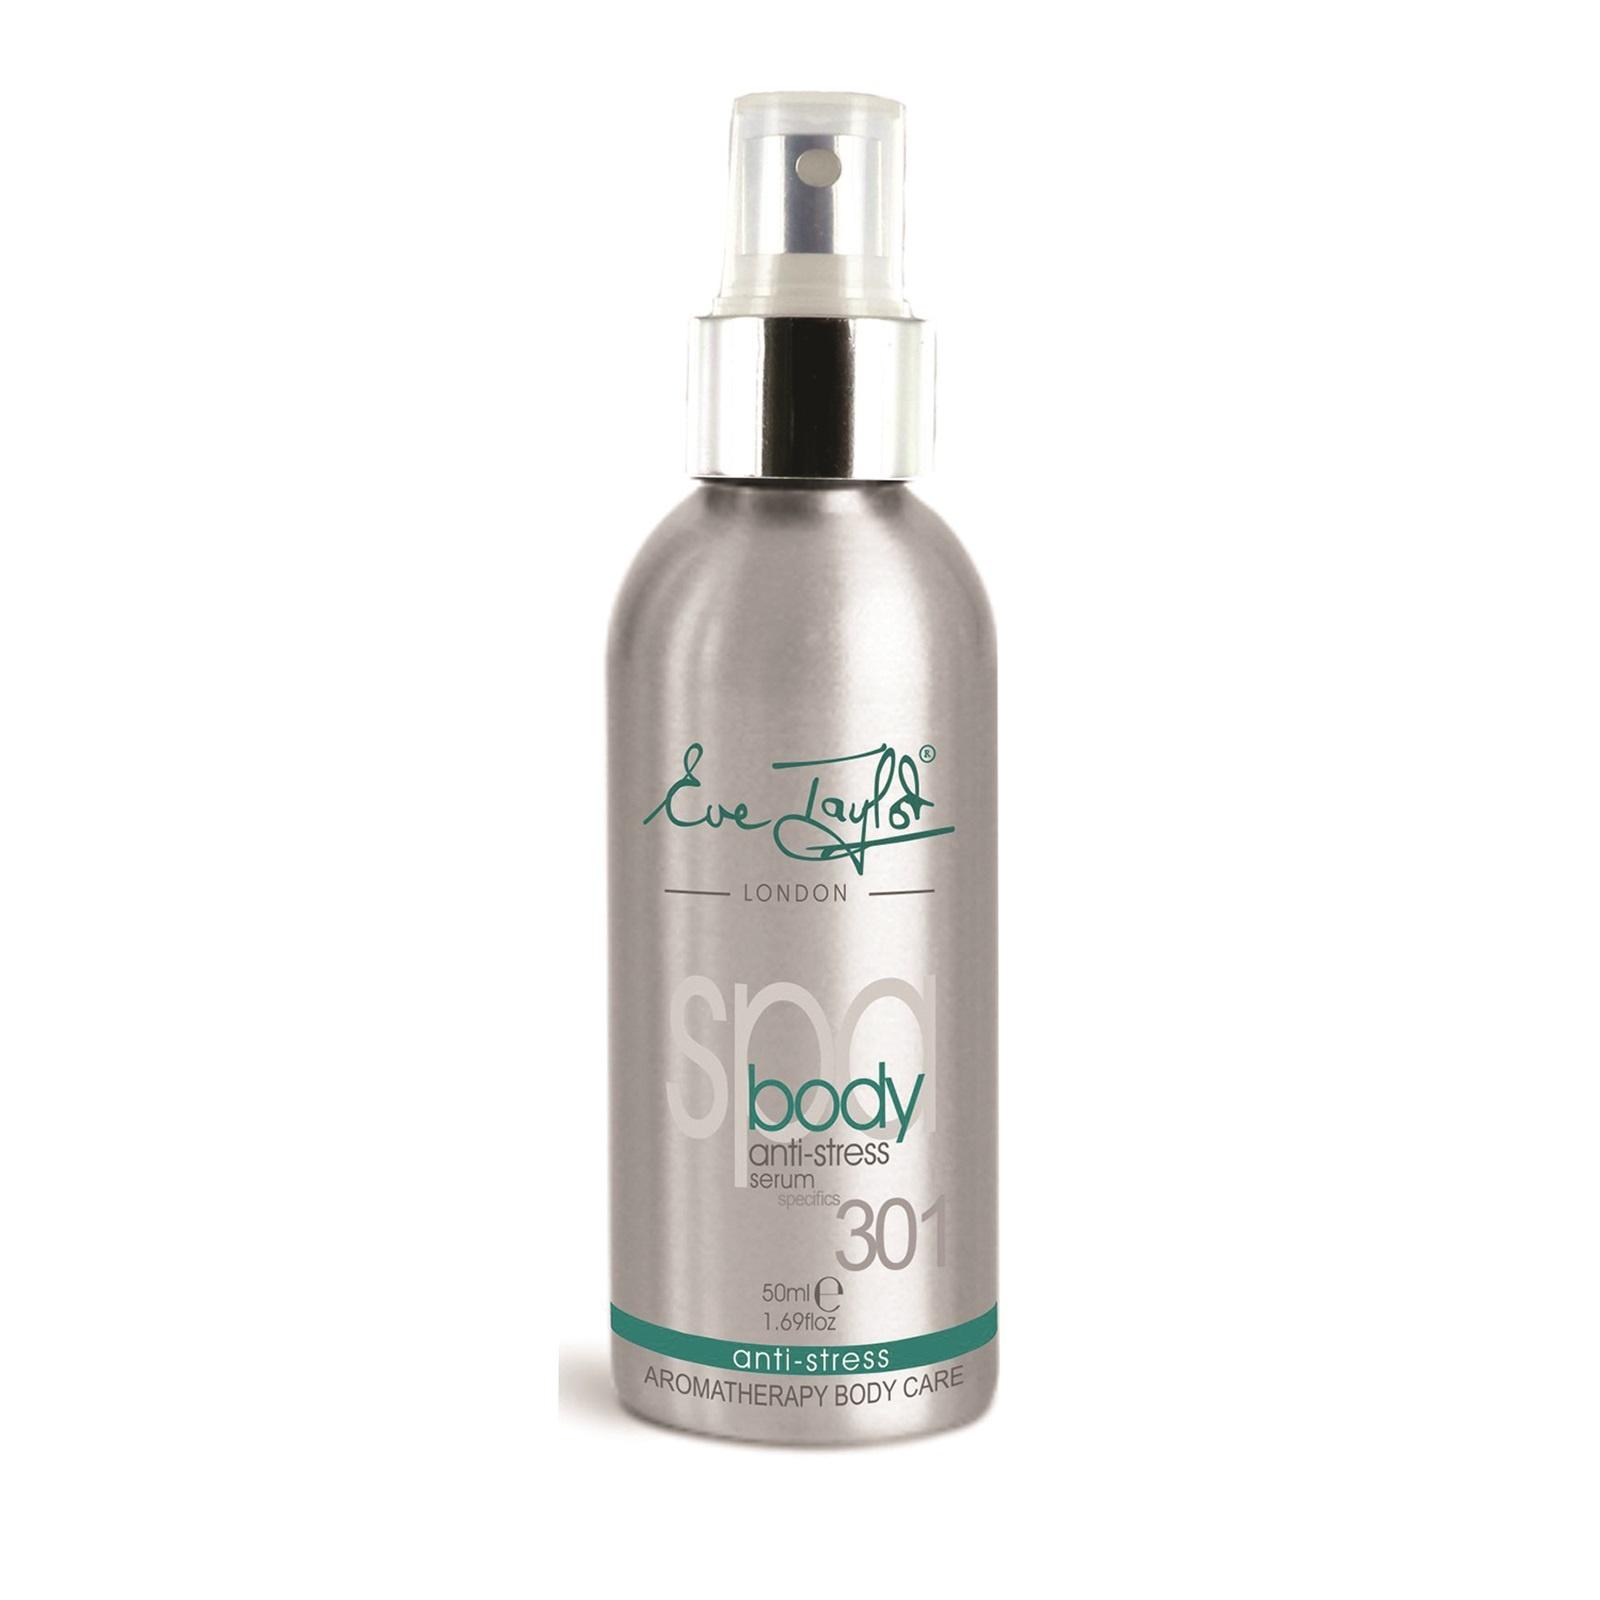 Eve Taylor Body Oil Specifics 301 Anti-Stress - Eve Taylor